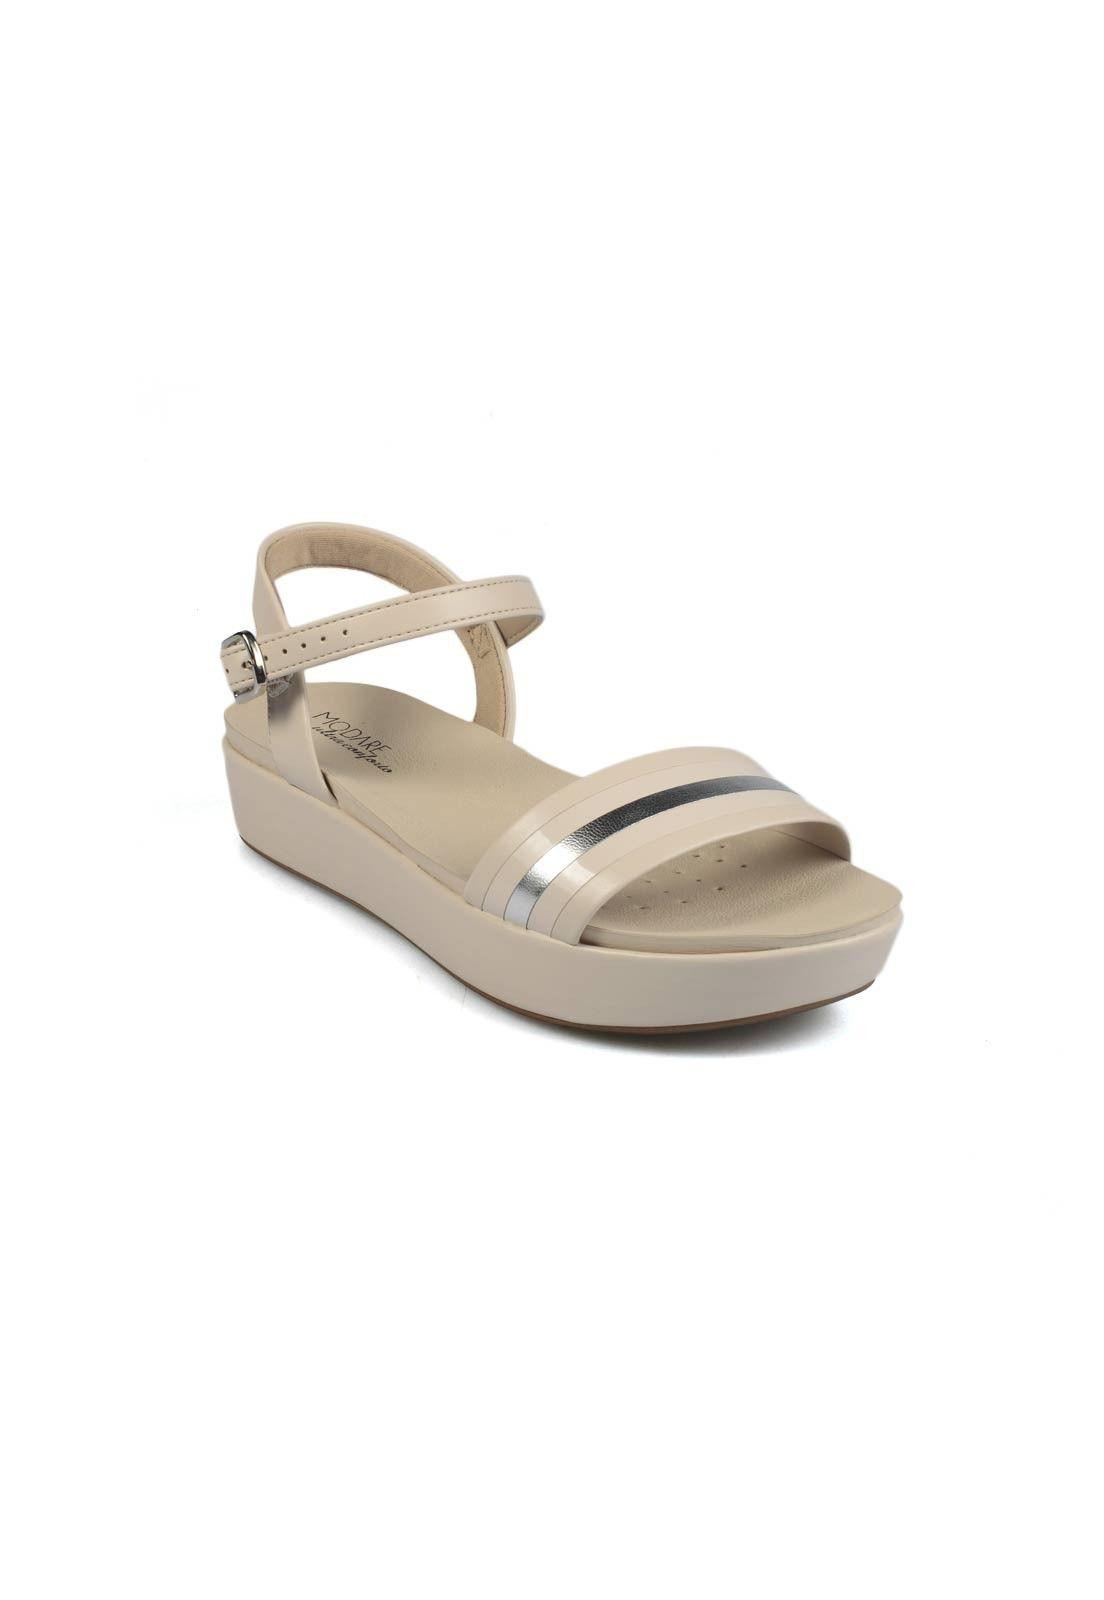 Sandalia Crema Modare Sandalias MUJER Zapatos de